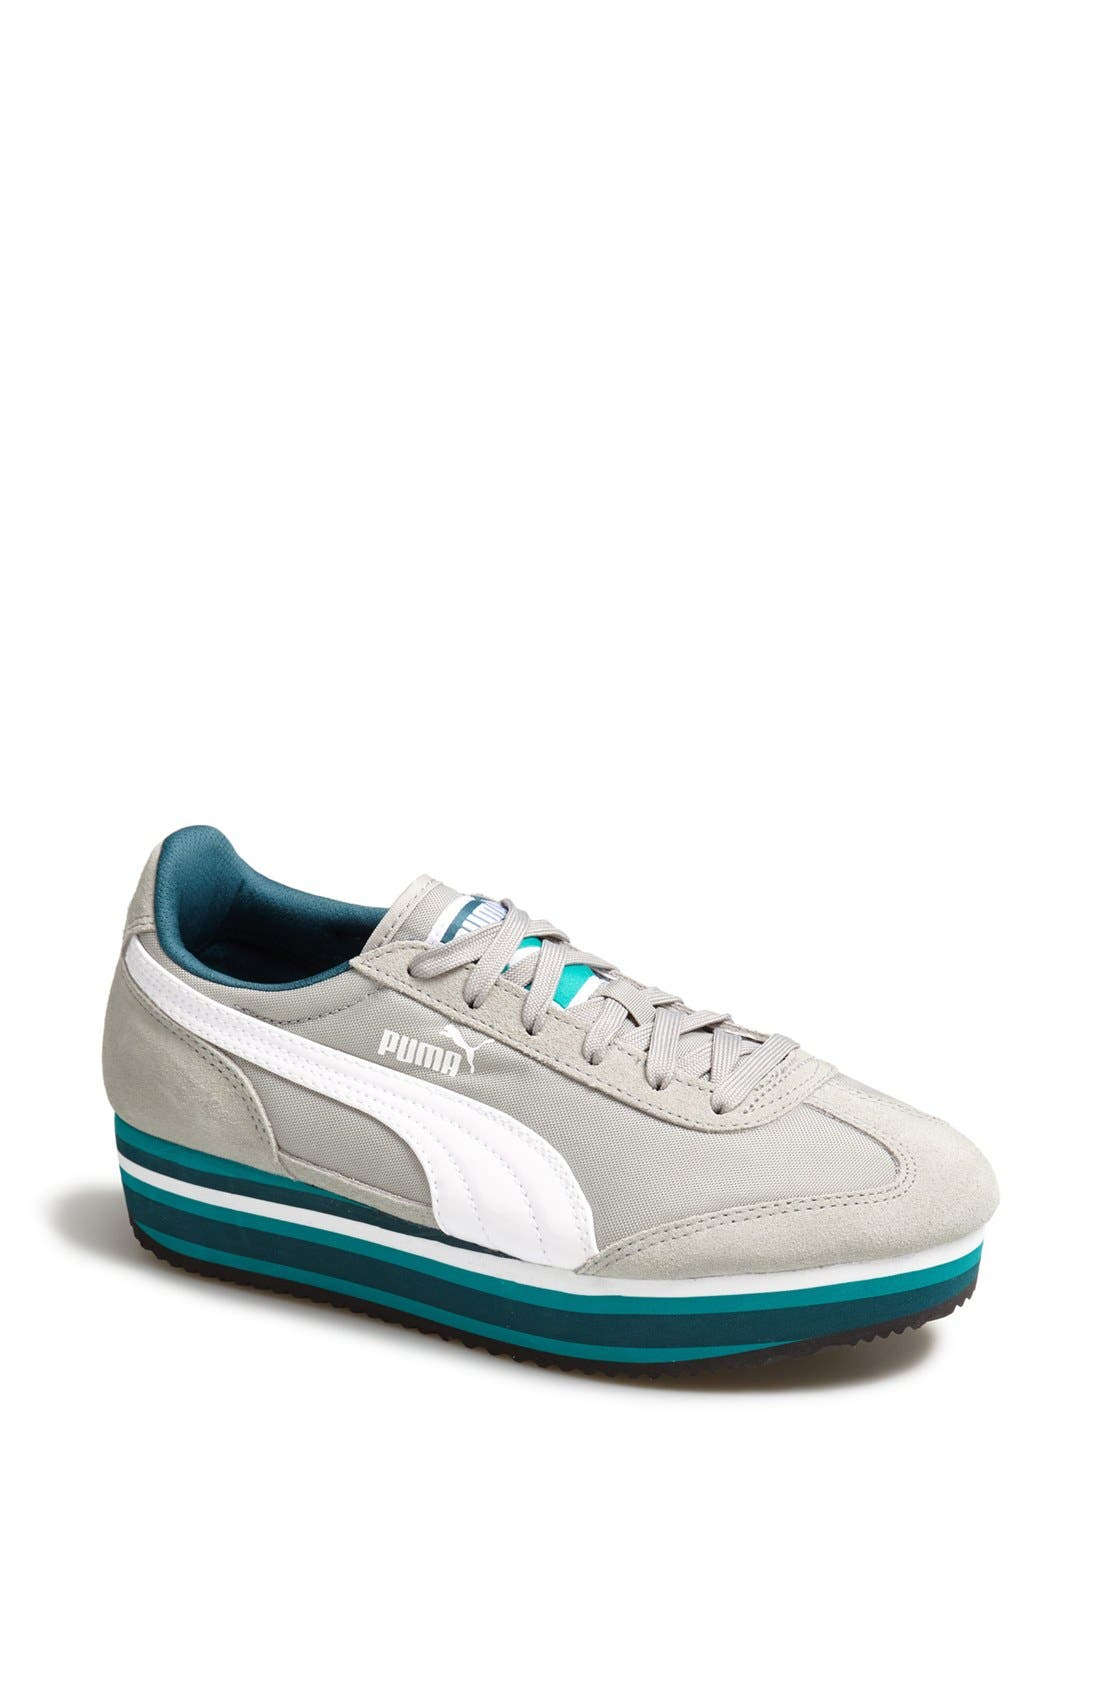 Alternate Image 1 Selected - PUMA 'SF 77' Platform Sneaker